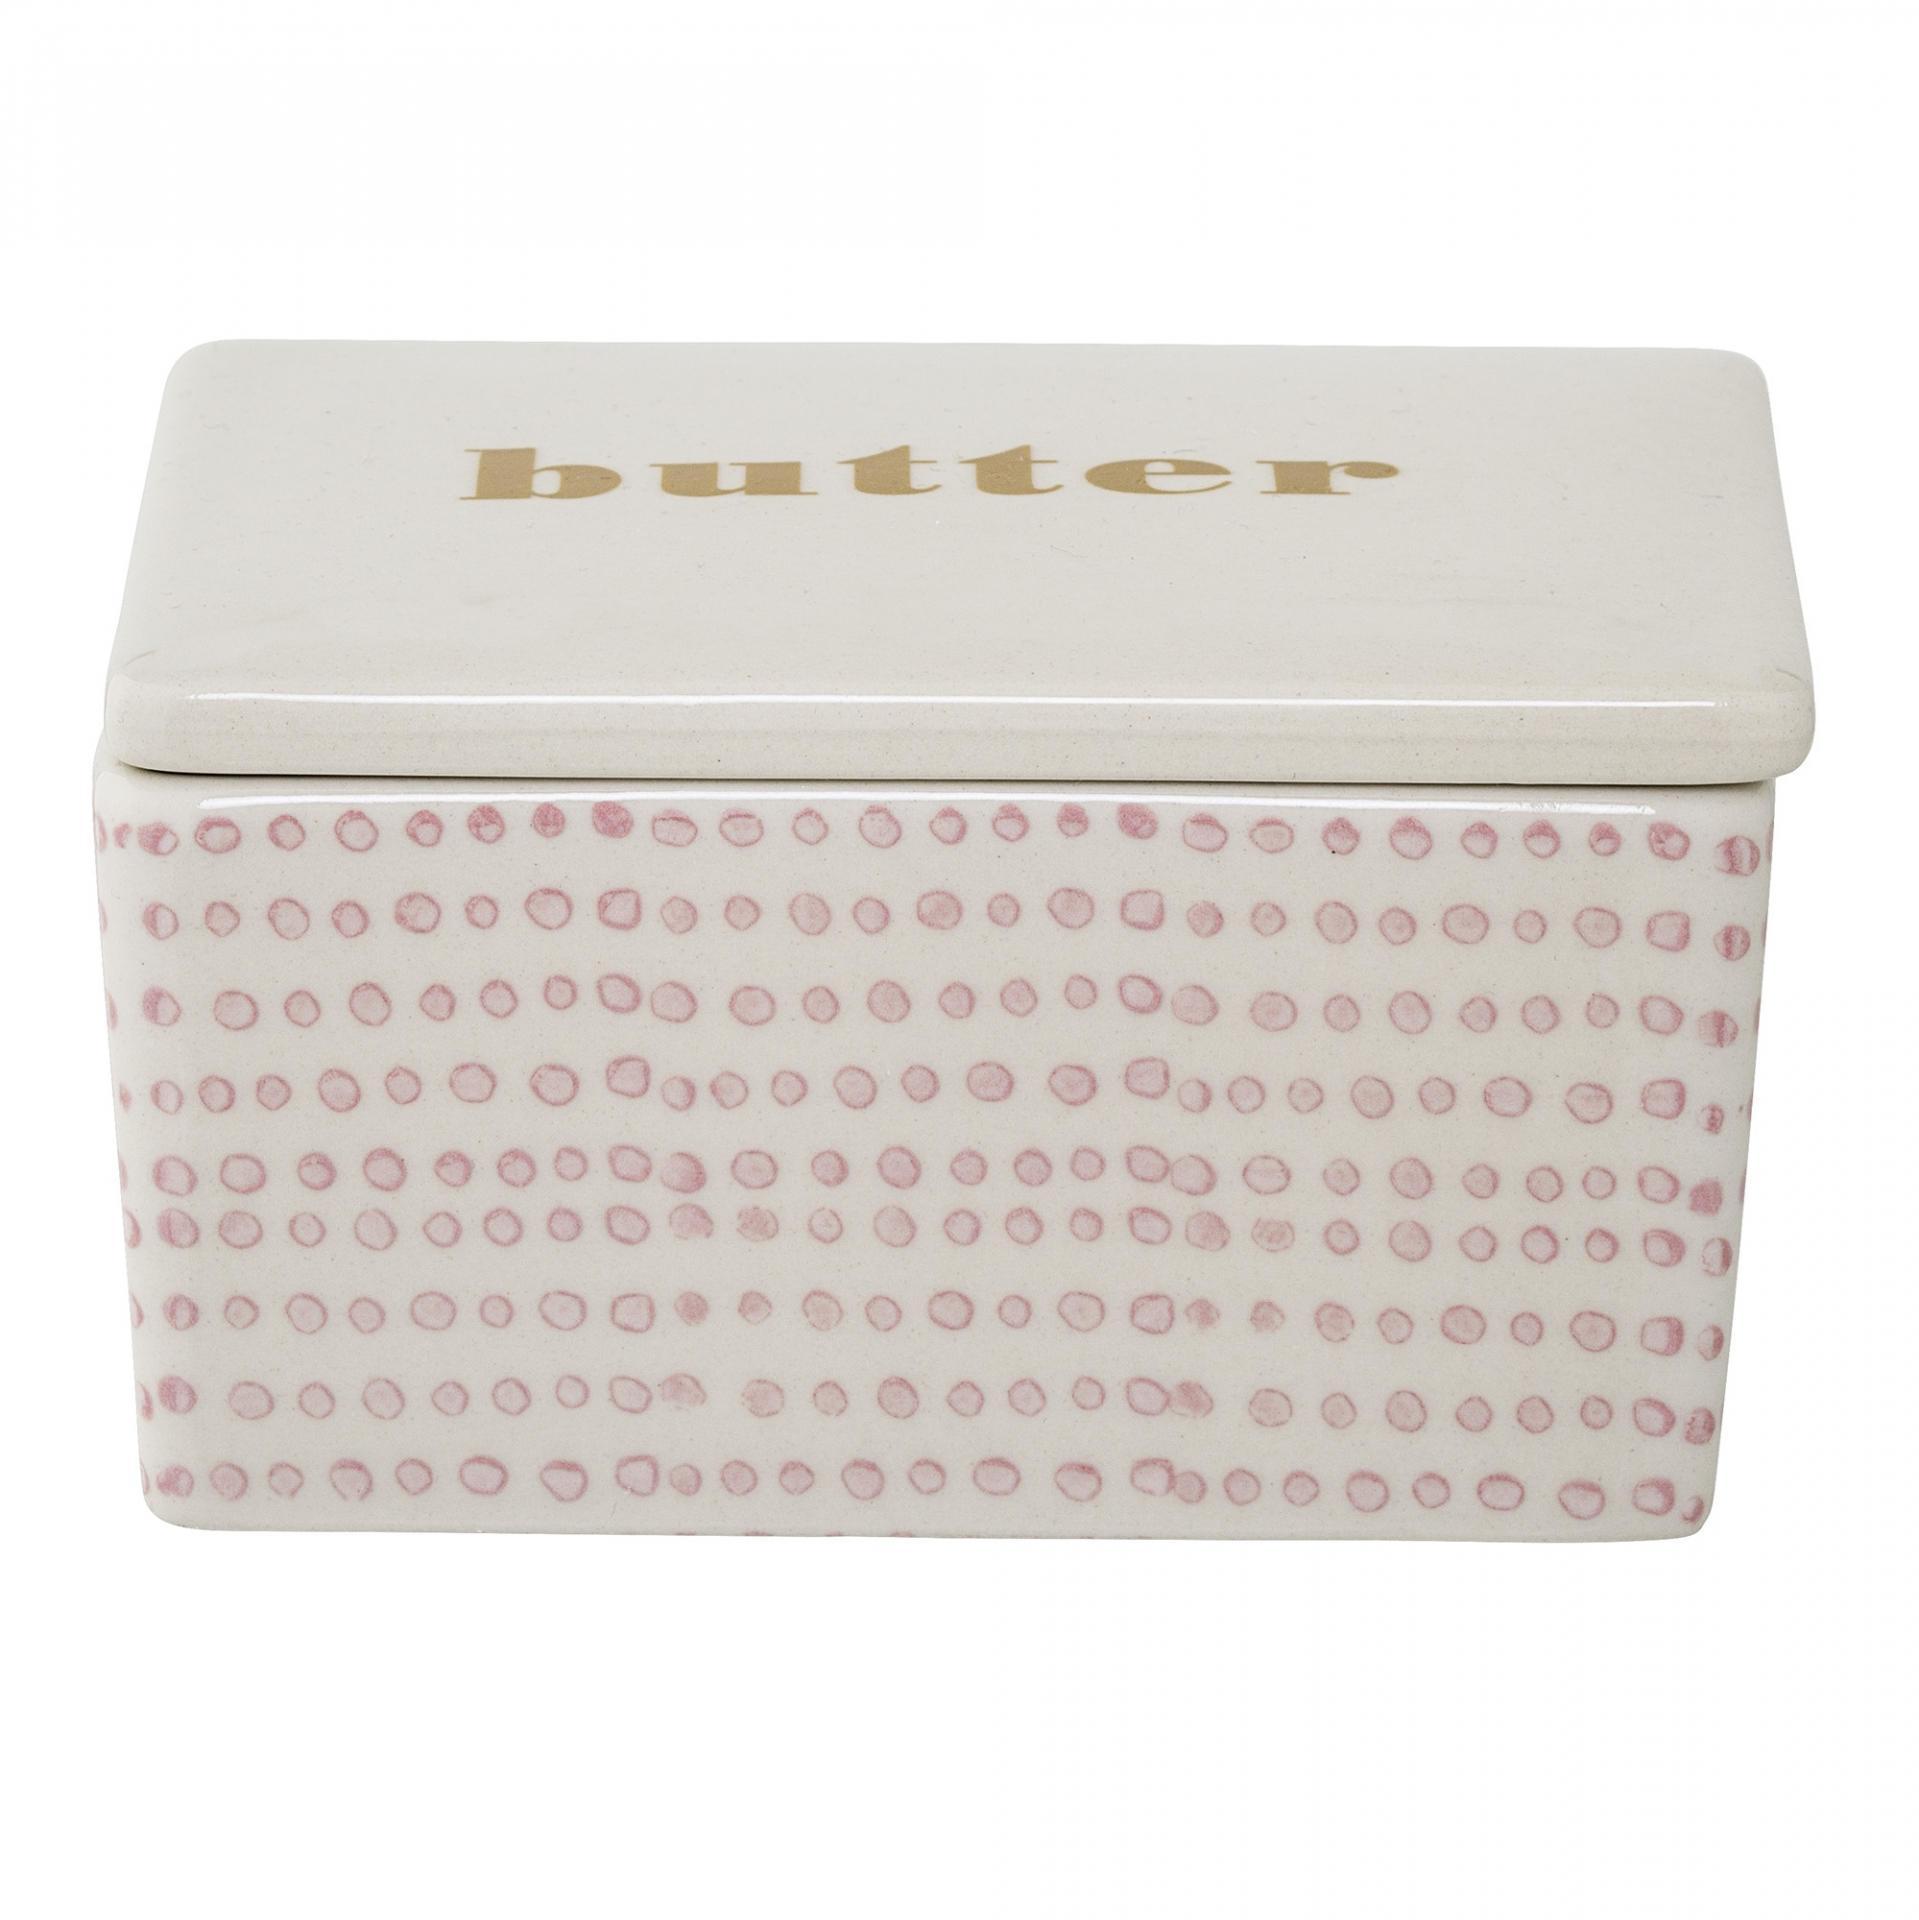 Bloomingville Keramická máslenka Susie, růžová barva, béžová barva, keramika